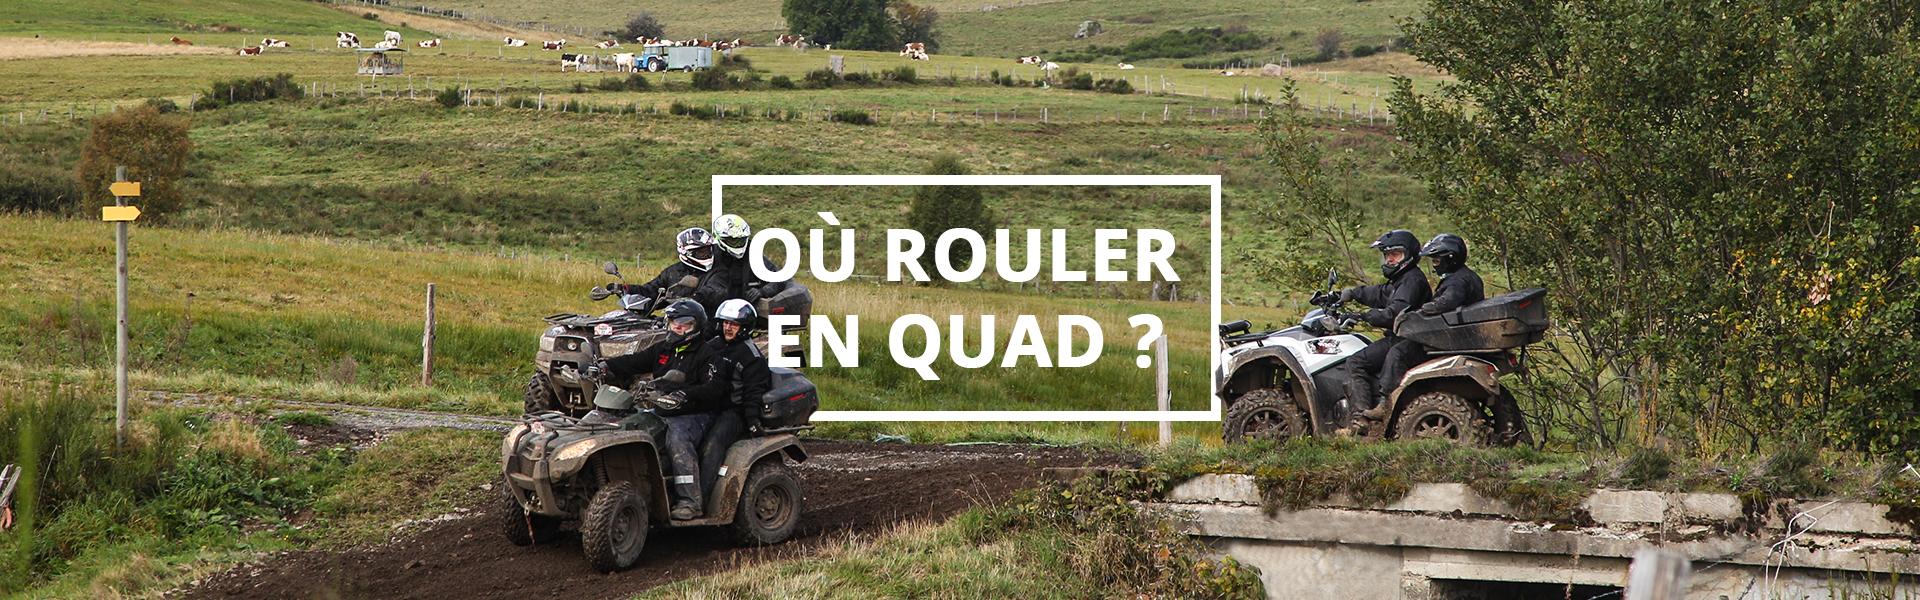 ou-rouler-quad